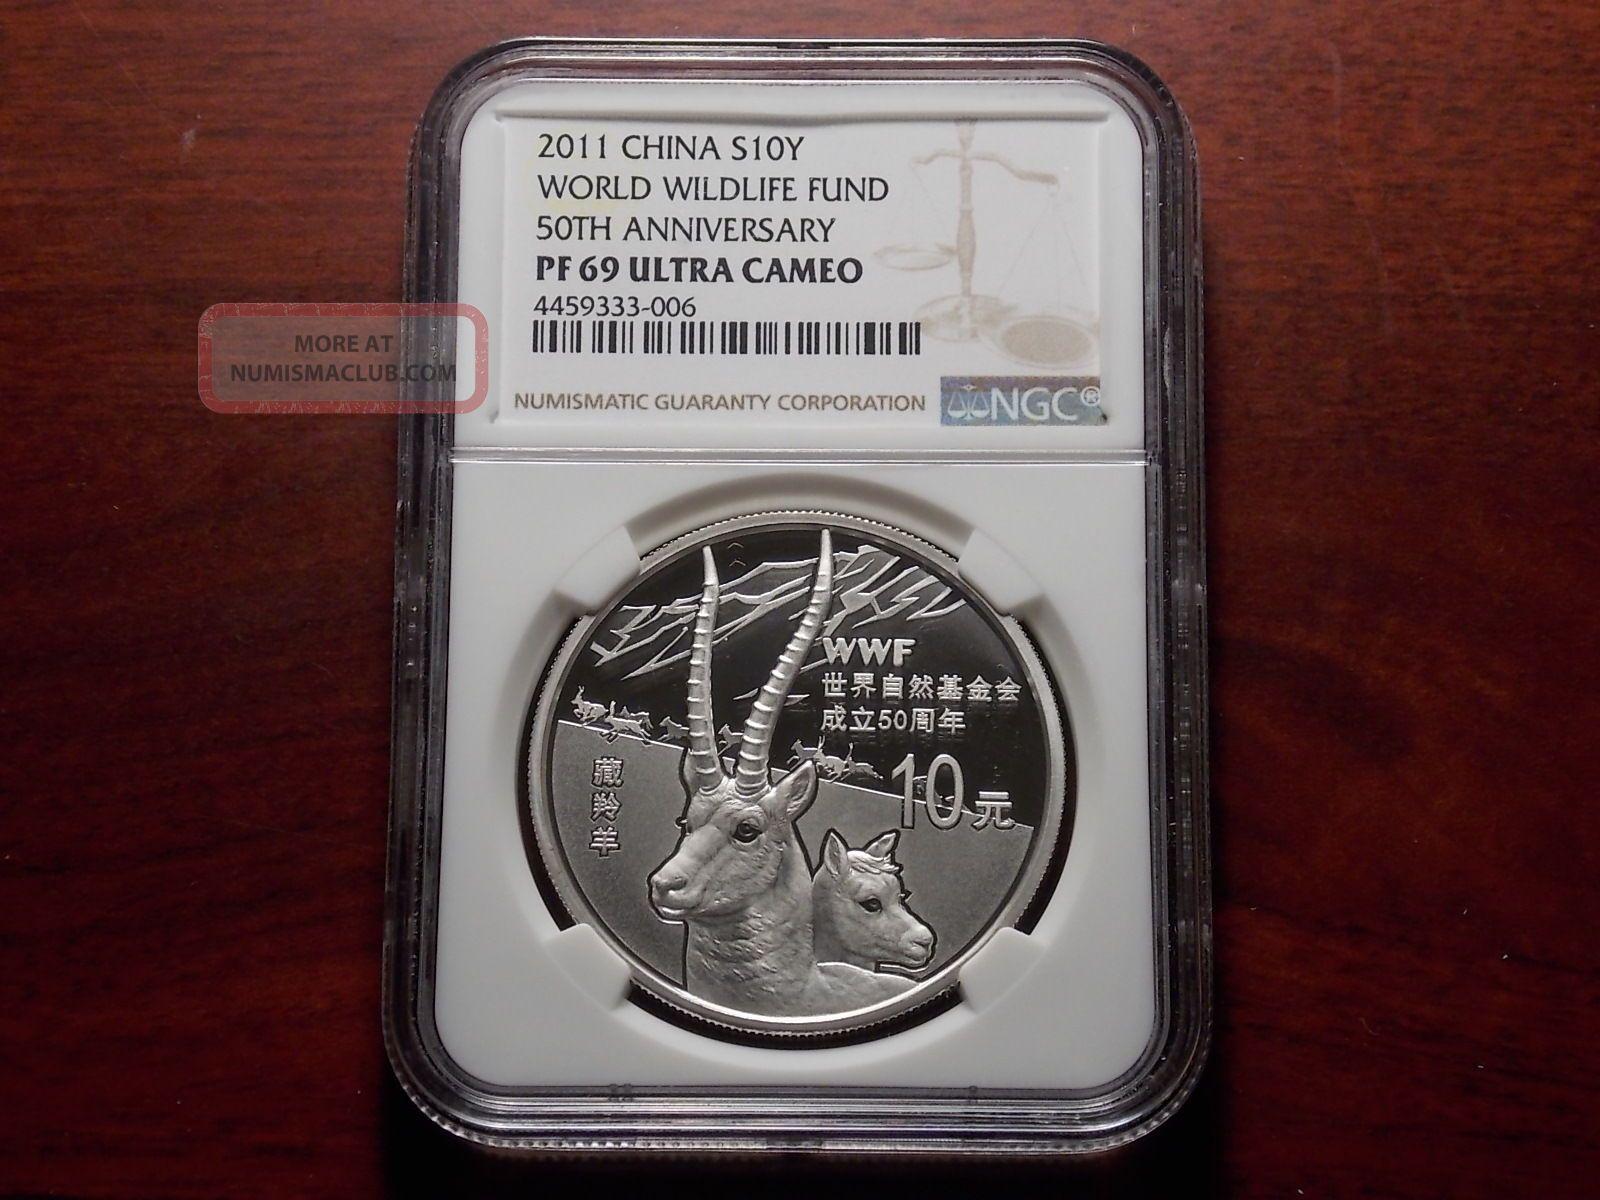 2011 China Wildlife Fund 1 Oz Silver 10 Yuan Proof Coin Ngc Pf - 69 Ultra Cameo China photo